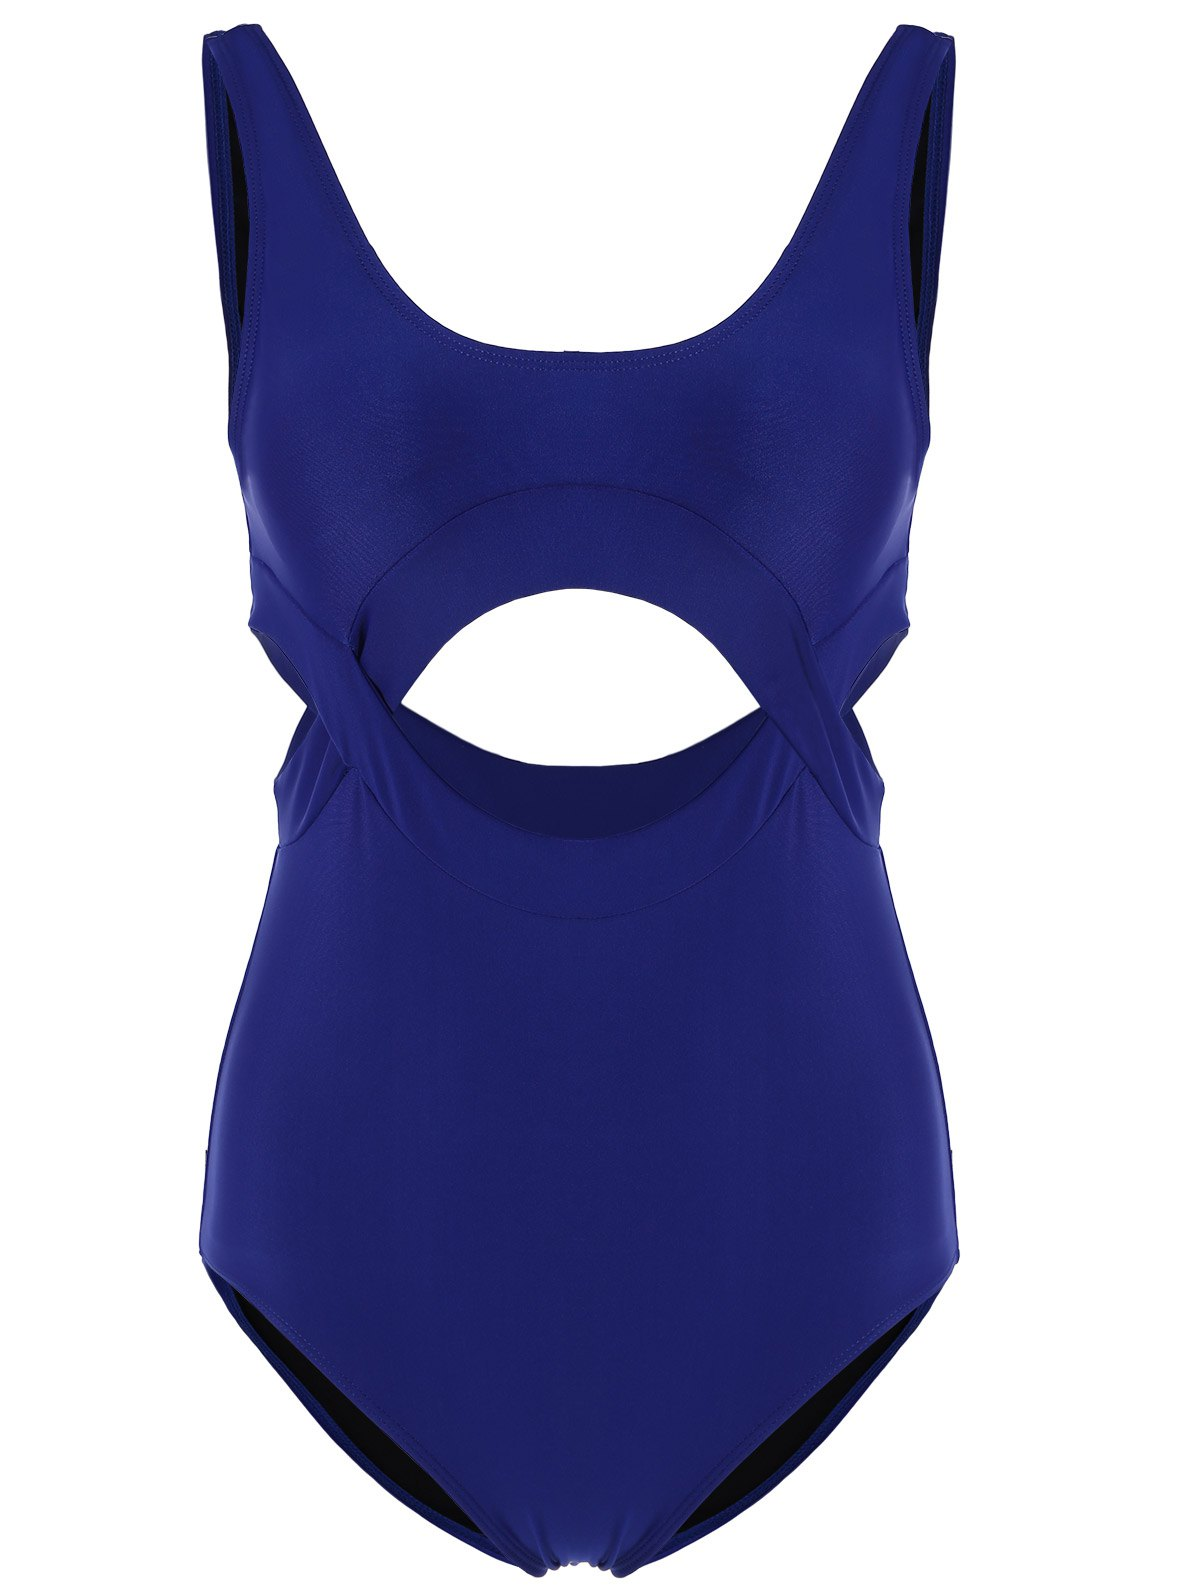 Scoop Neck High Cut One-Piece Swimwear